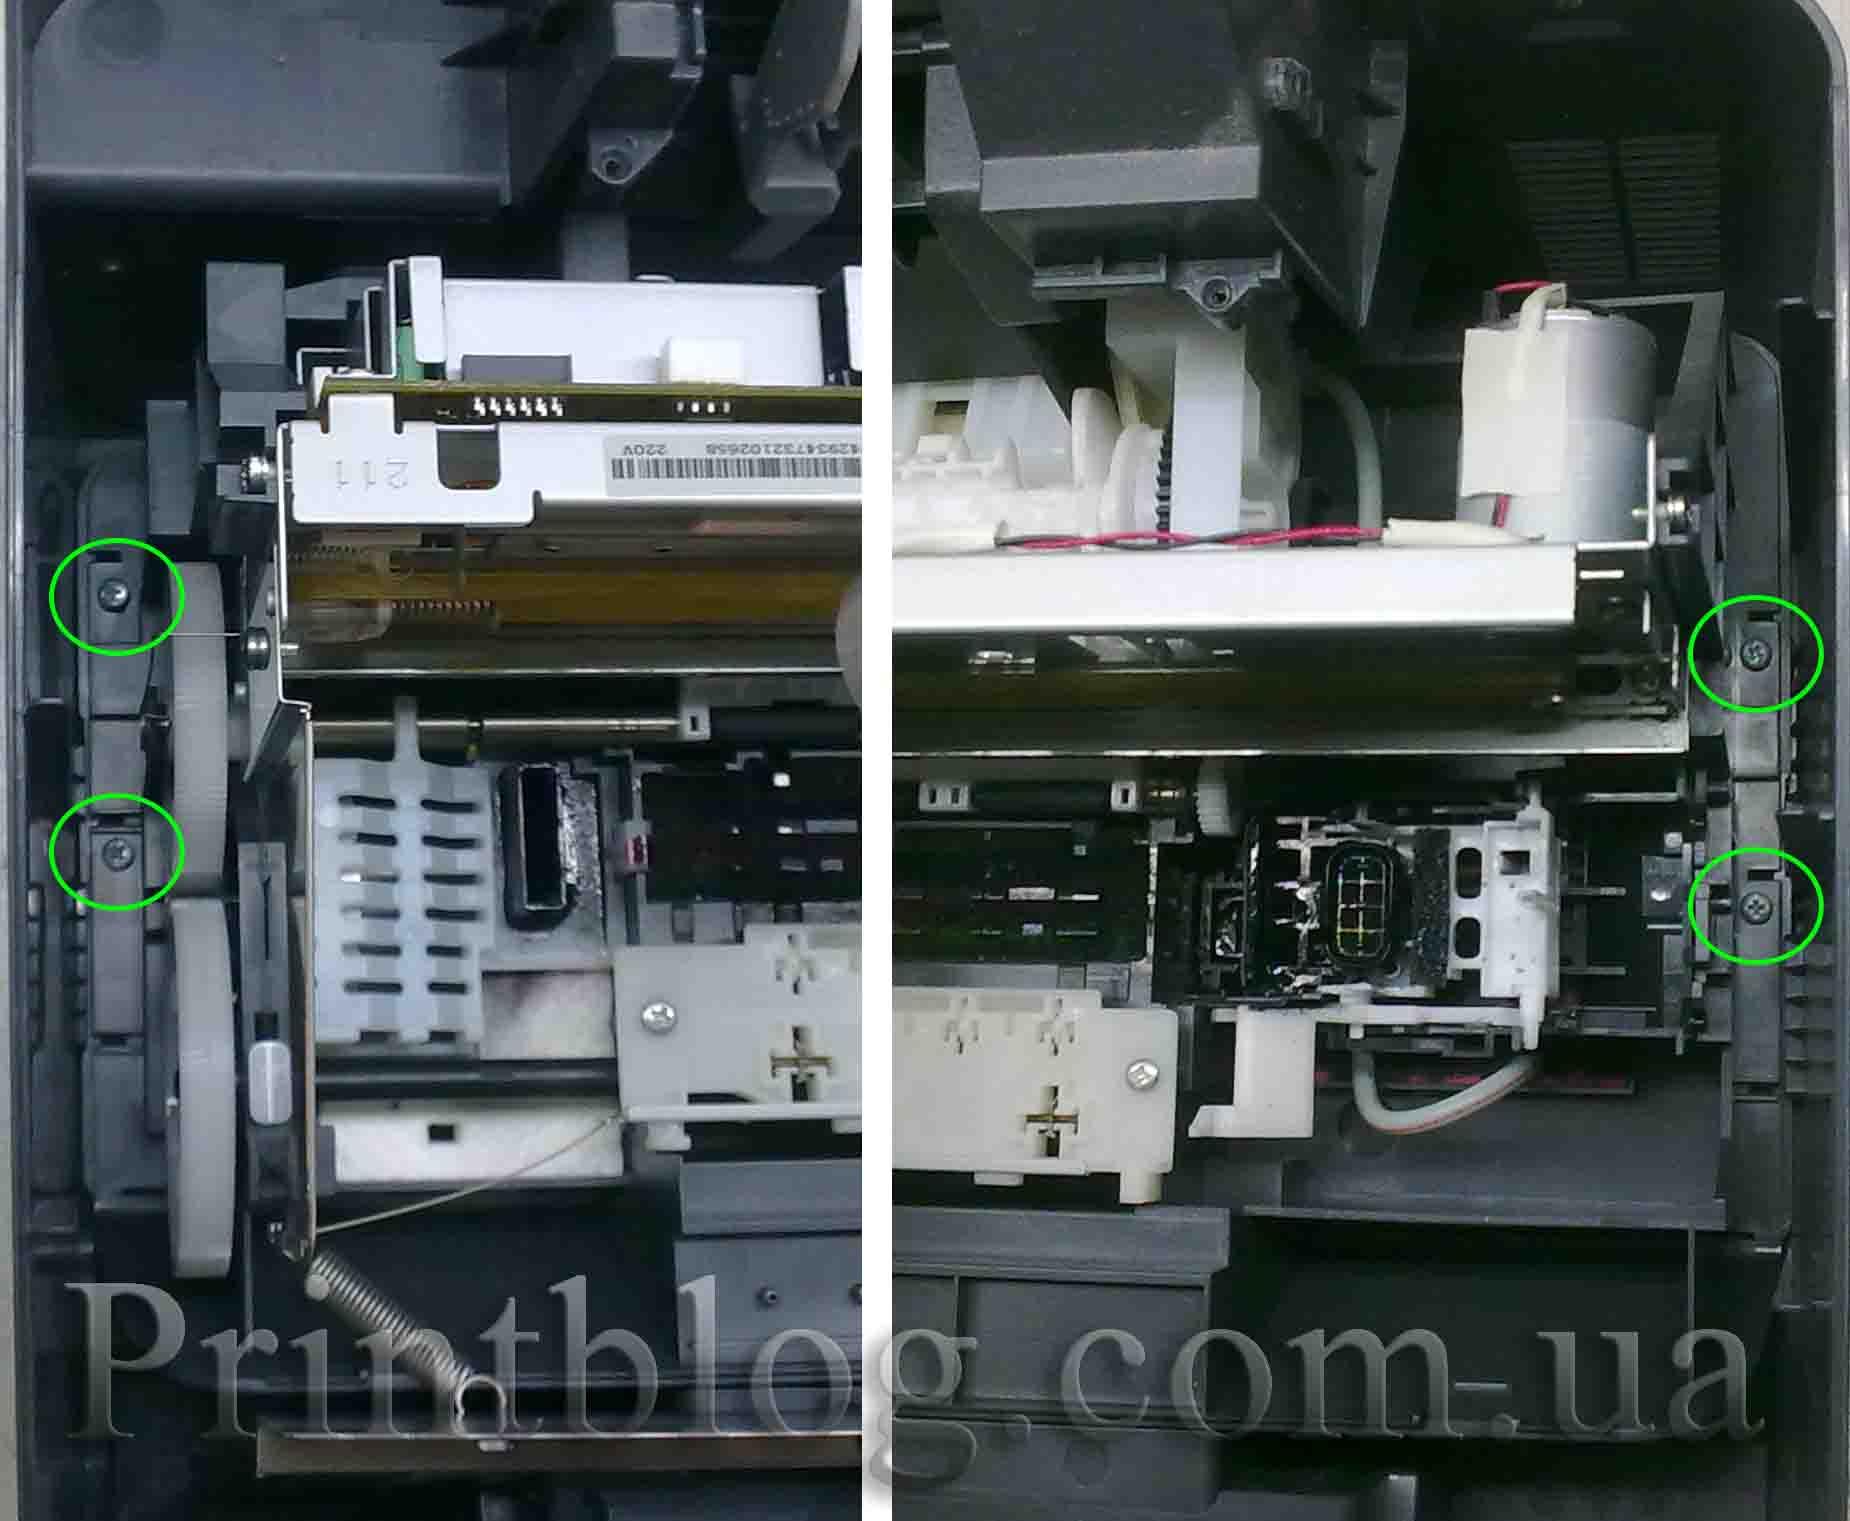 Epson stylus cx4900 инструкция